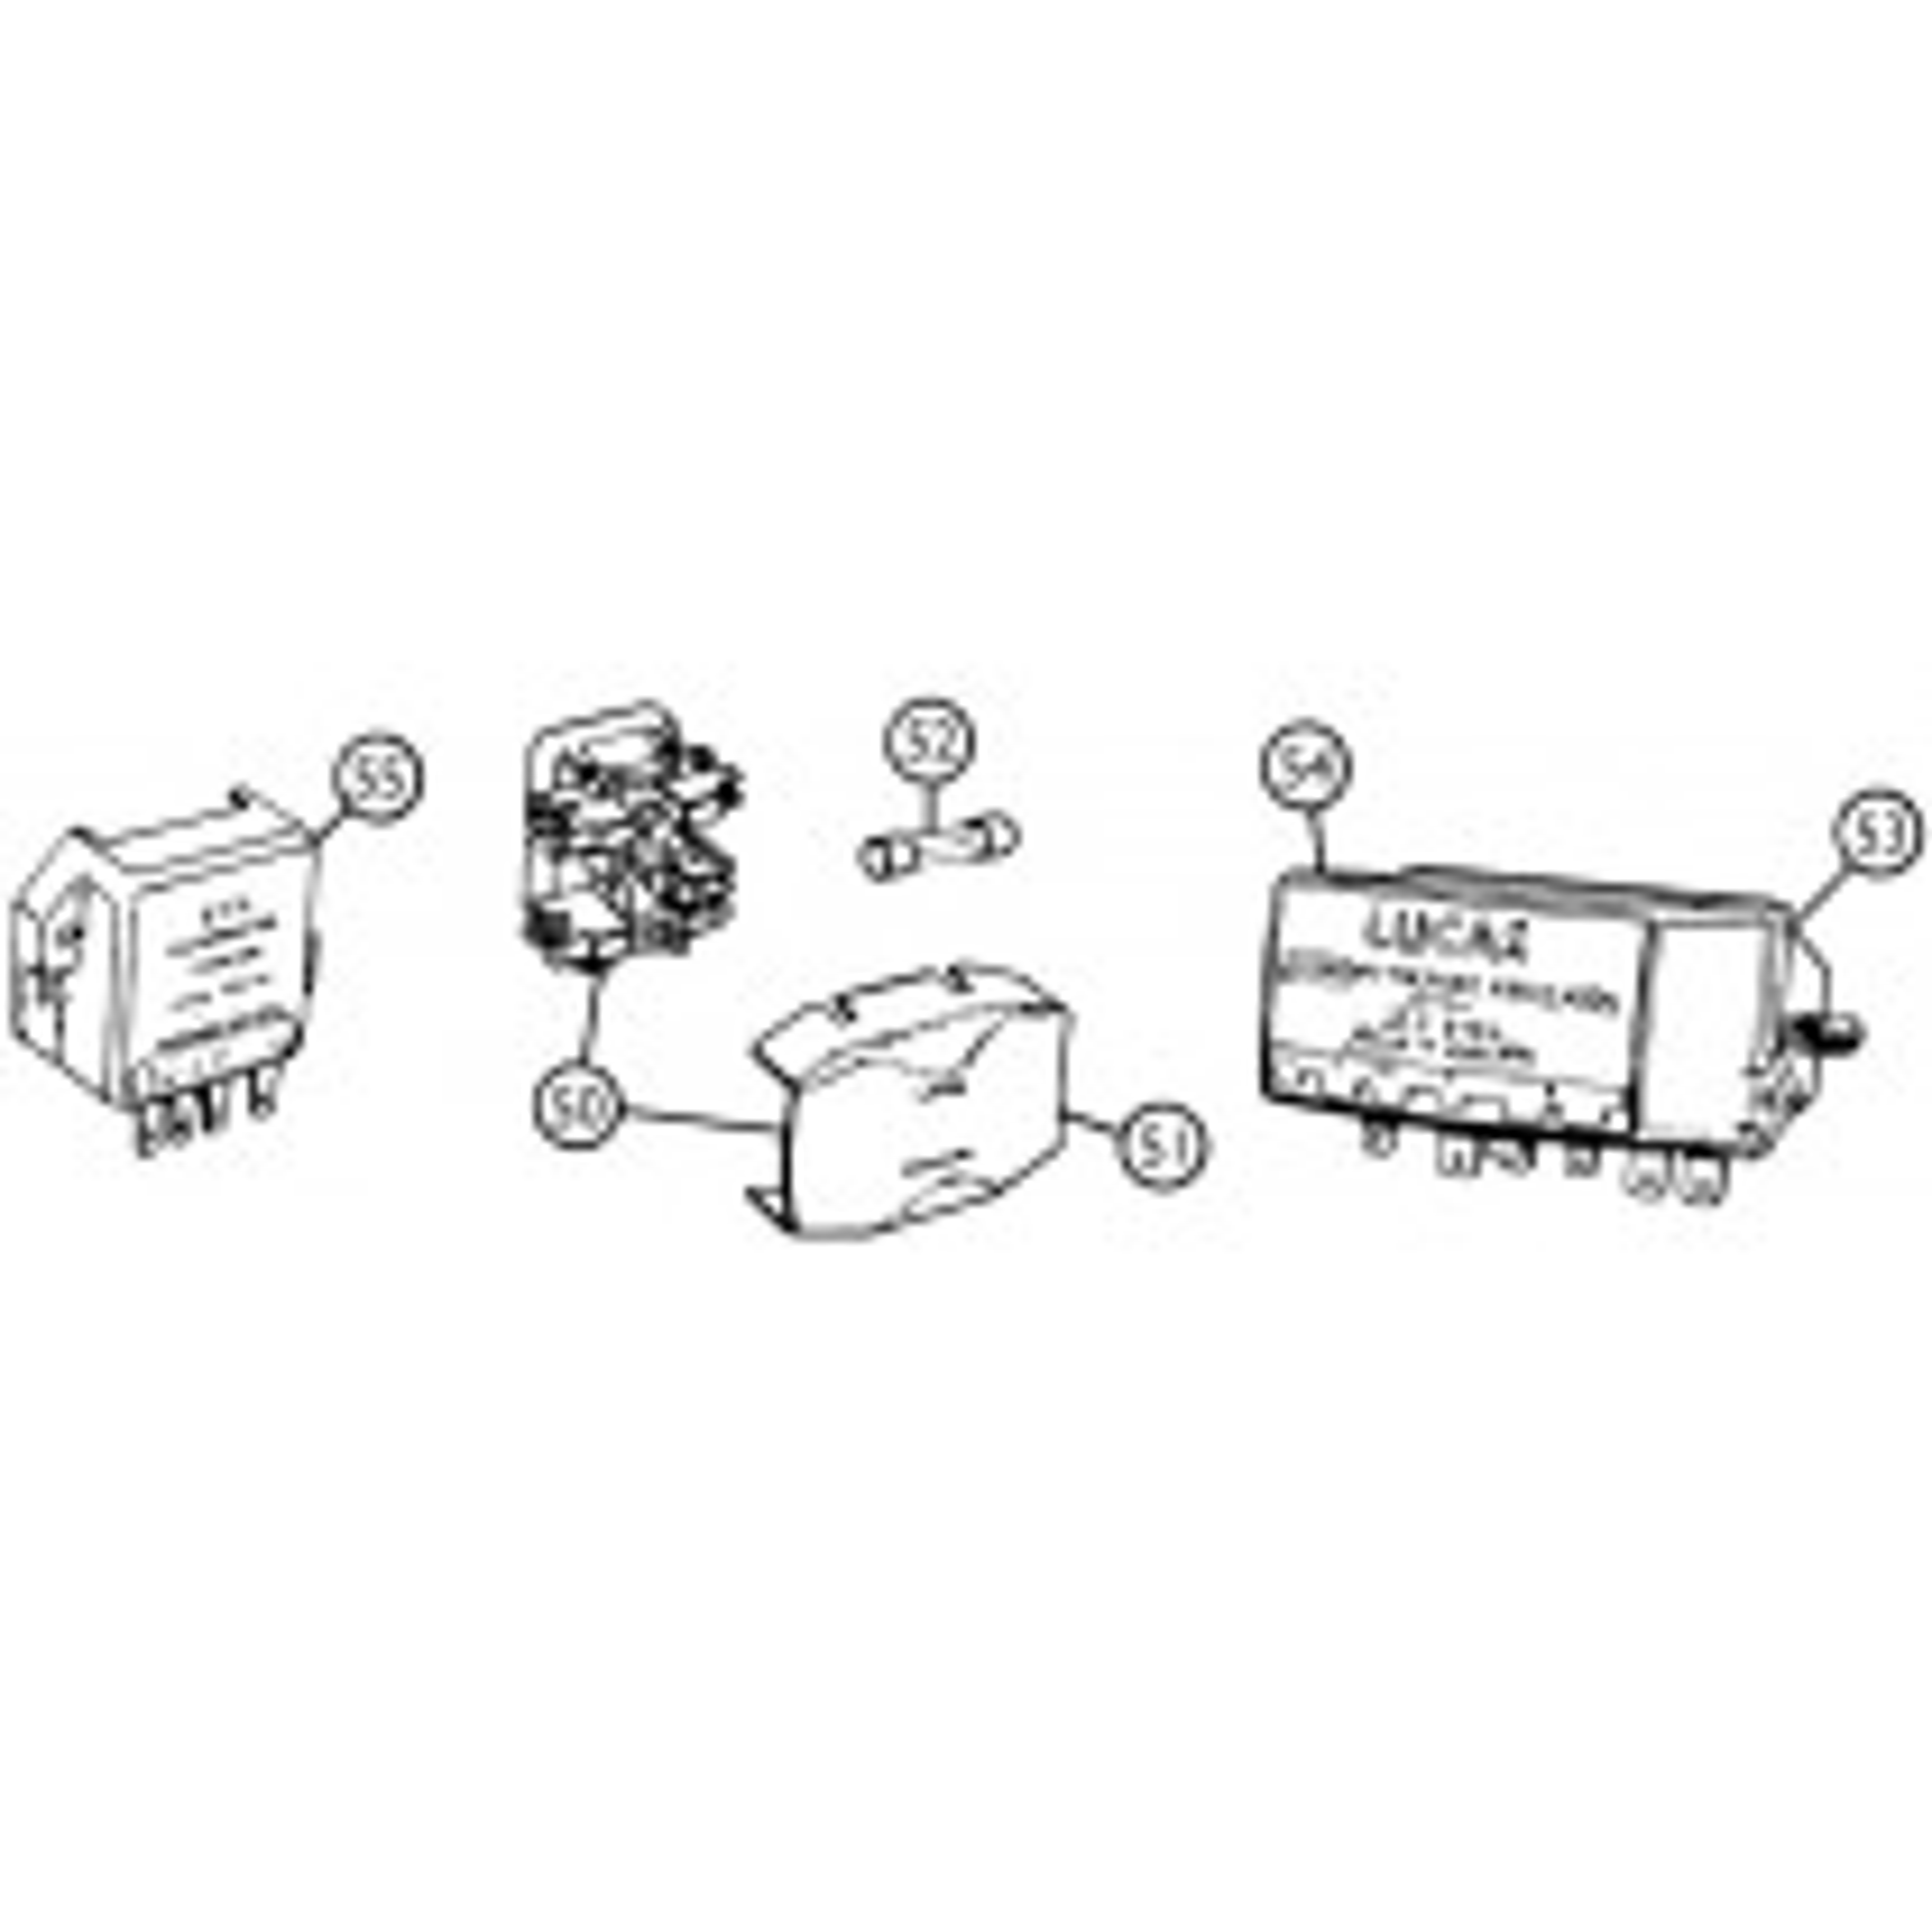 wiring harnesses  u0026 fittings - electrical  u0026 ignition